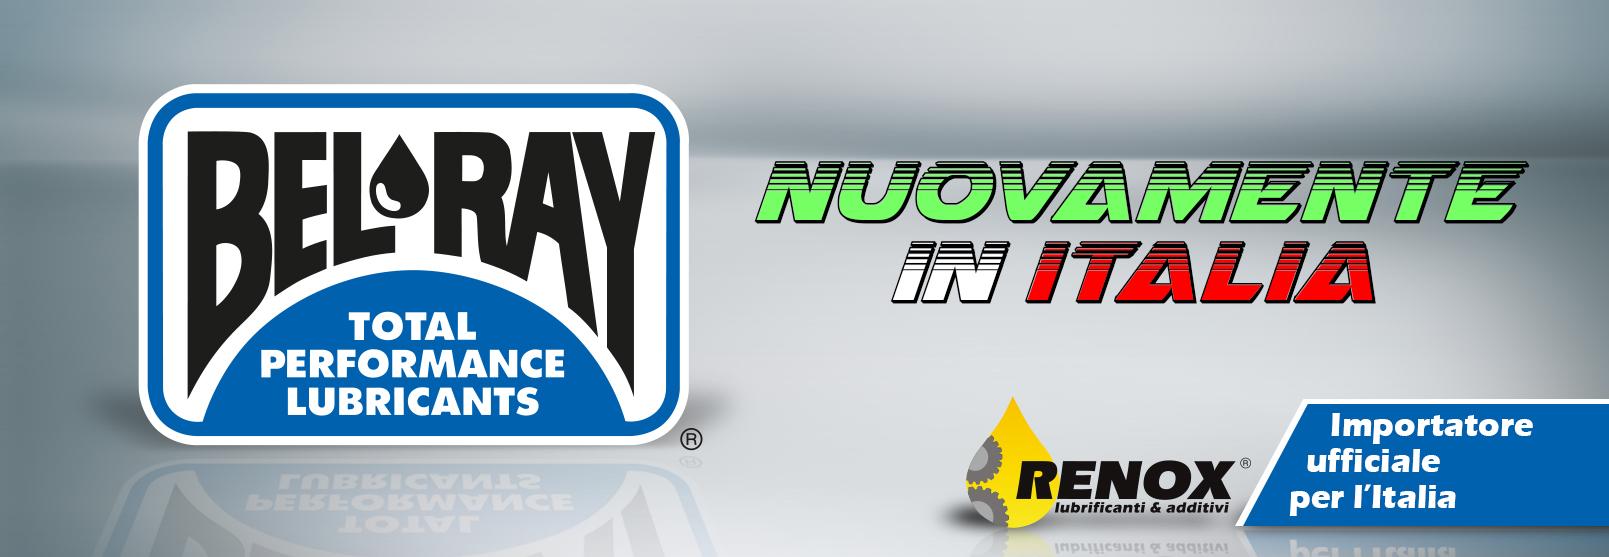 Bel-Ray PowerSports torna in Italia